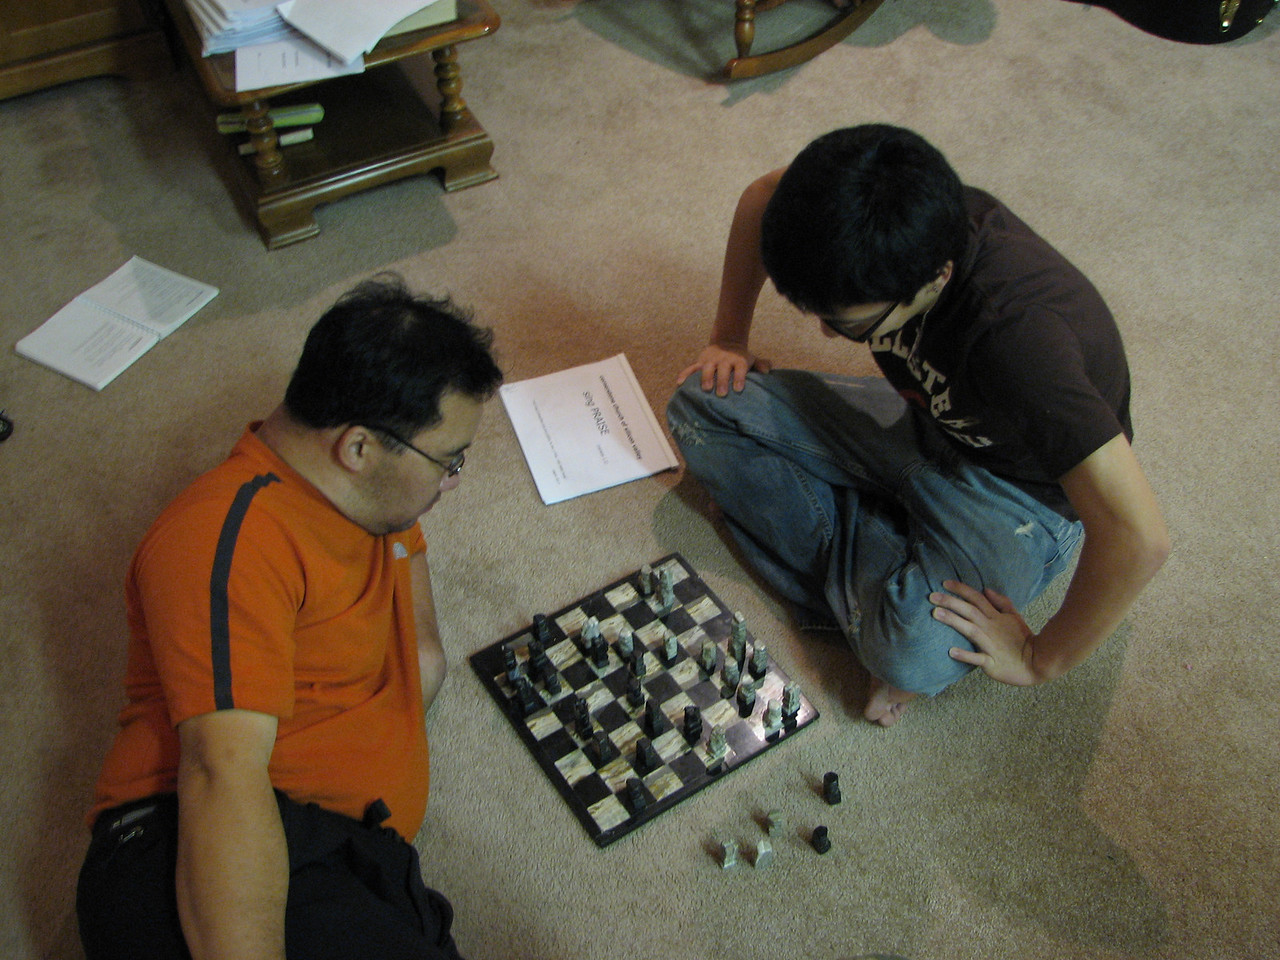 2006 12 22 Fri - Pastor Paul & Jimmy Lee play chess